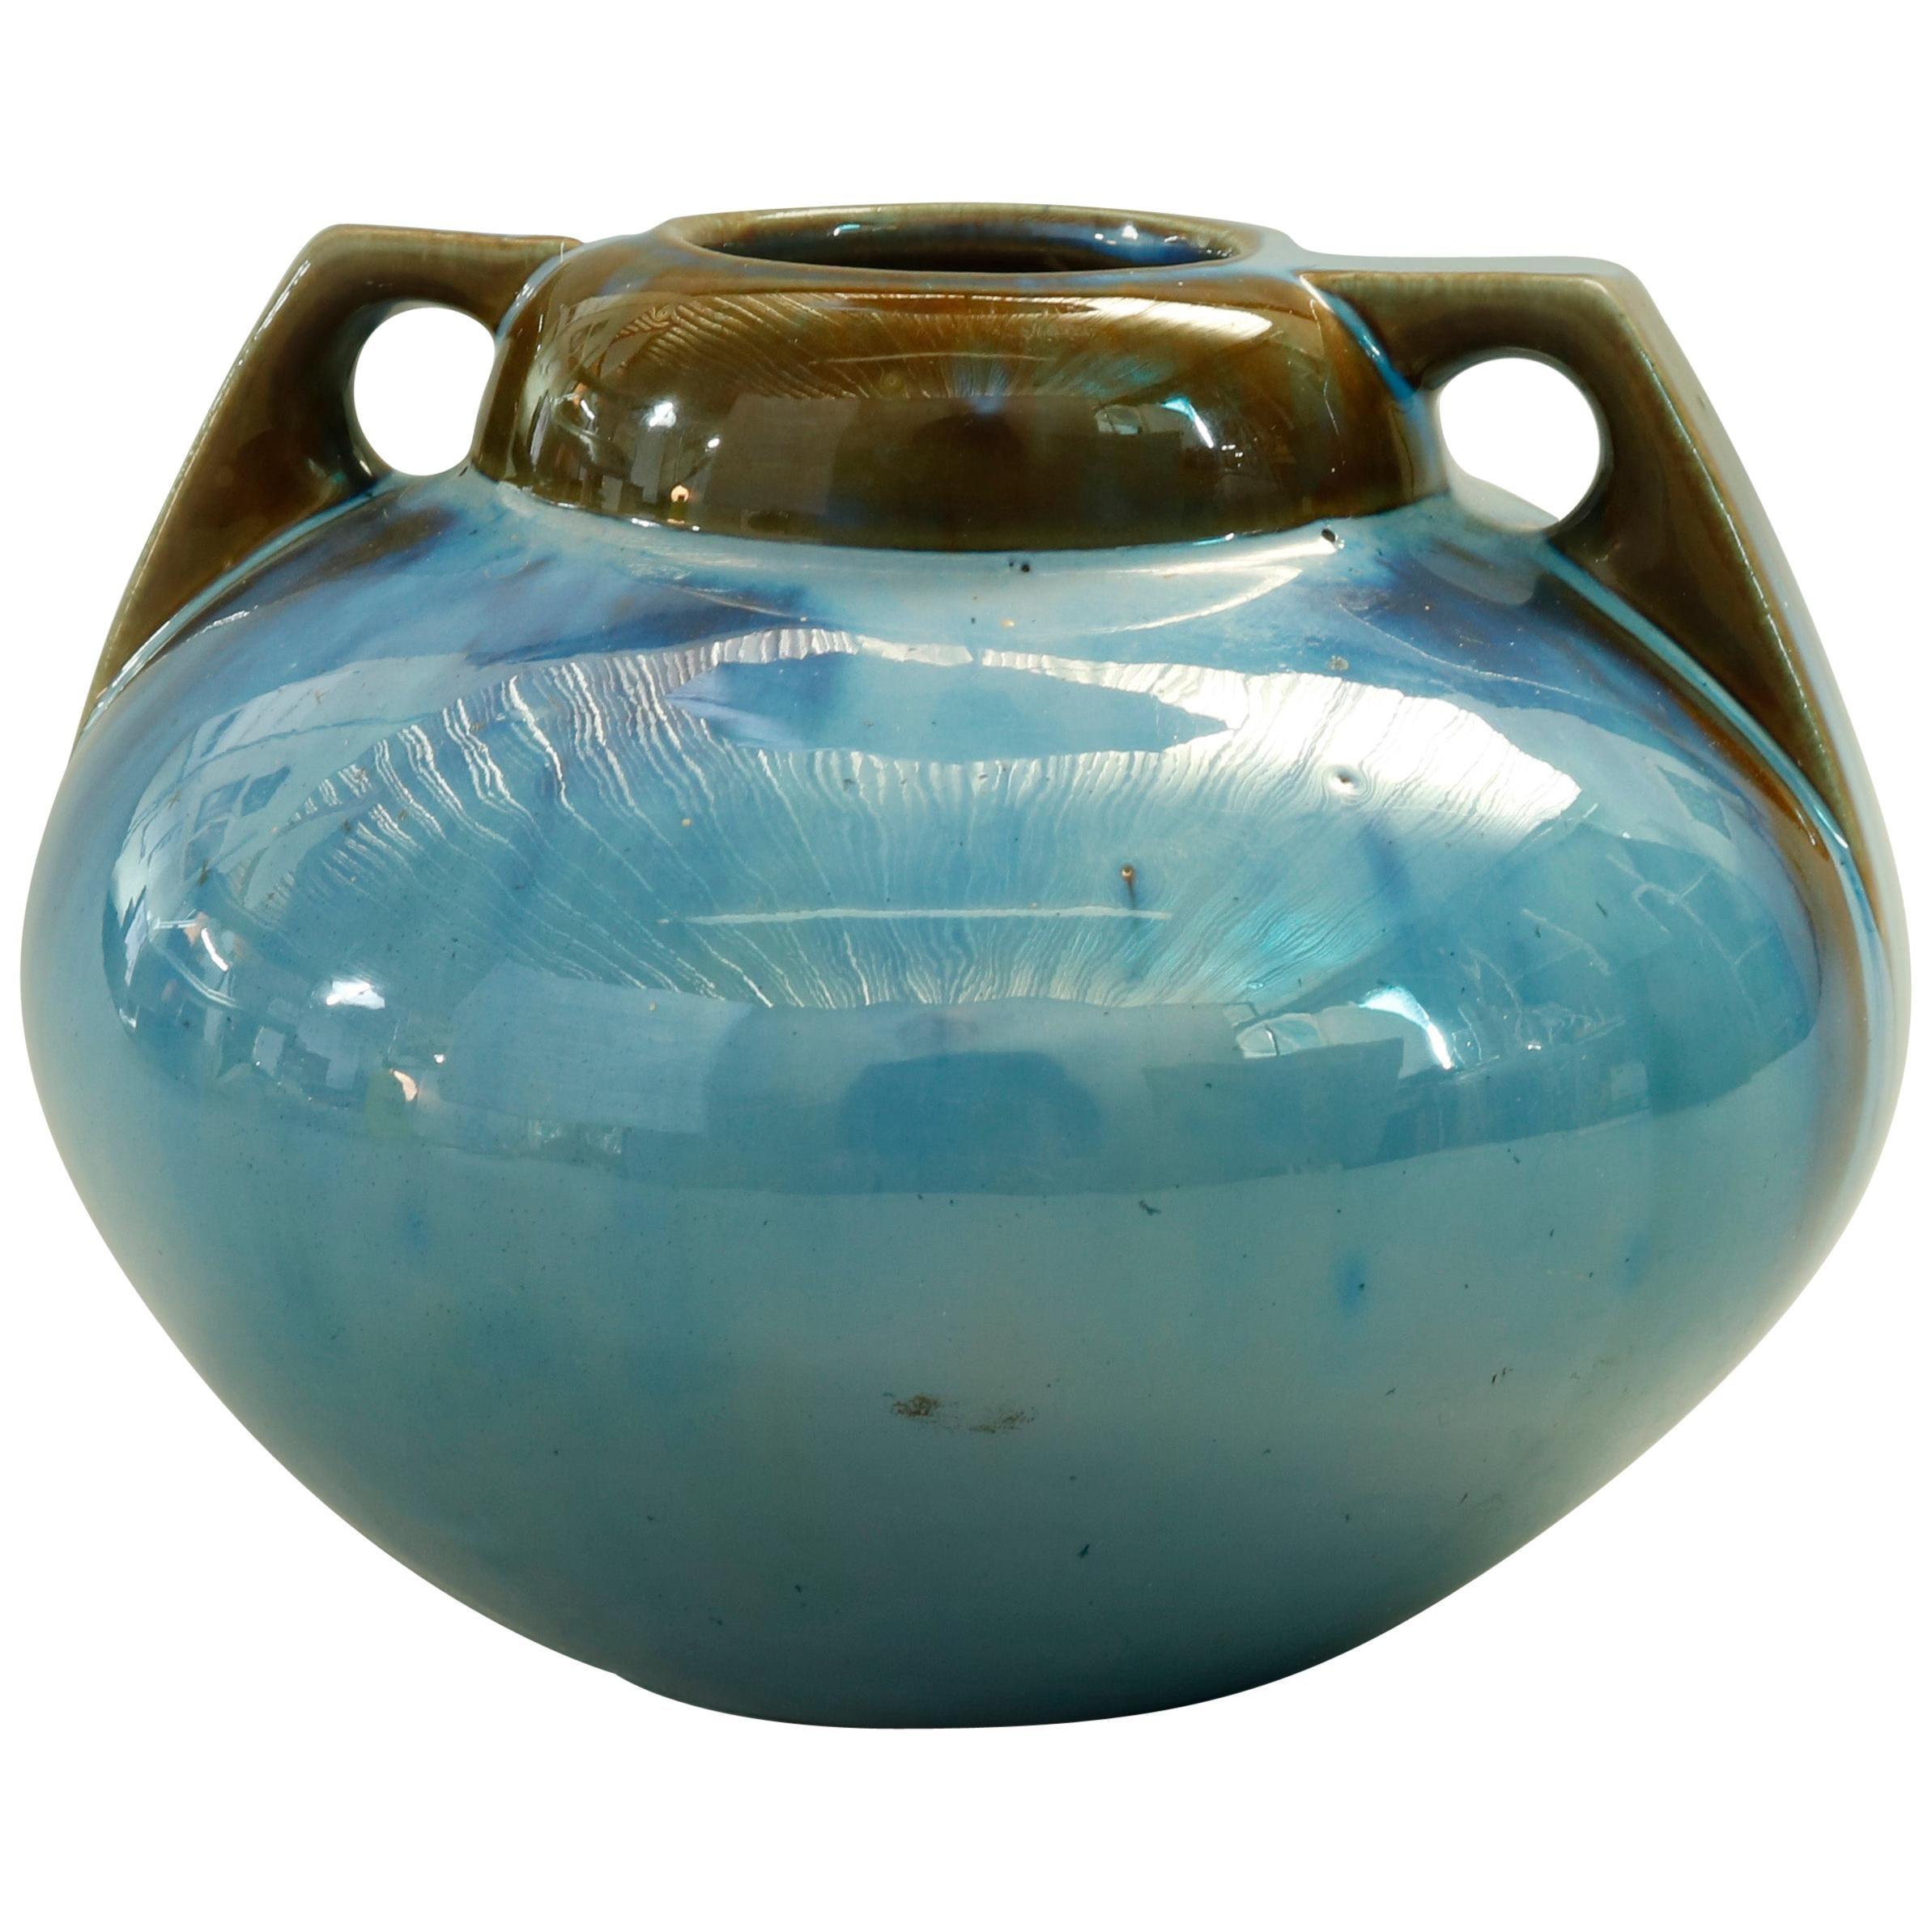 Vintage Art Pottery Mirrored Glaze Gourd Form Vase by Fulper, 20th Century